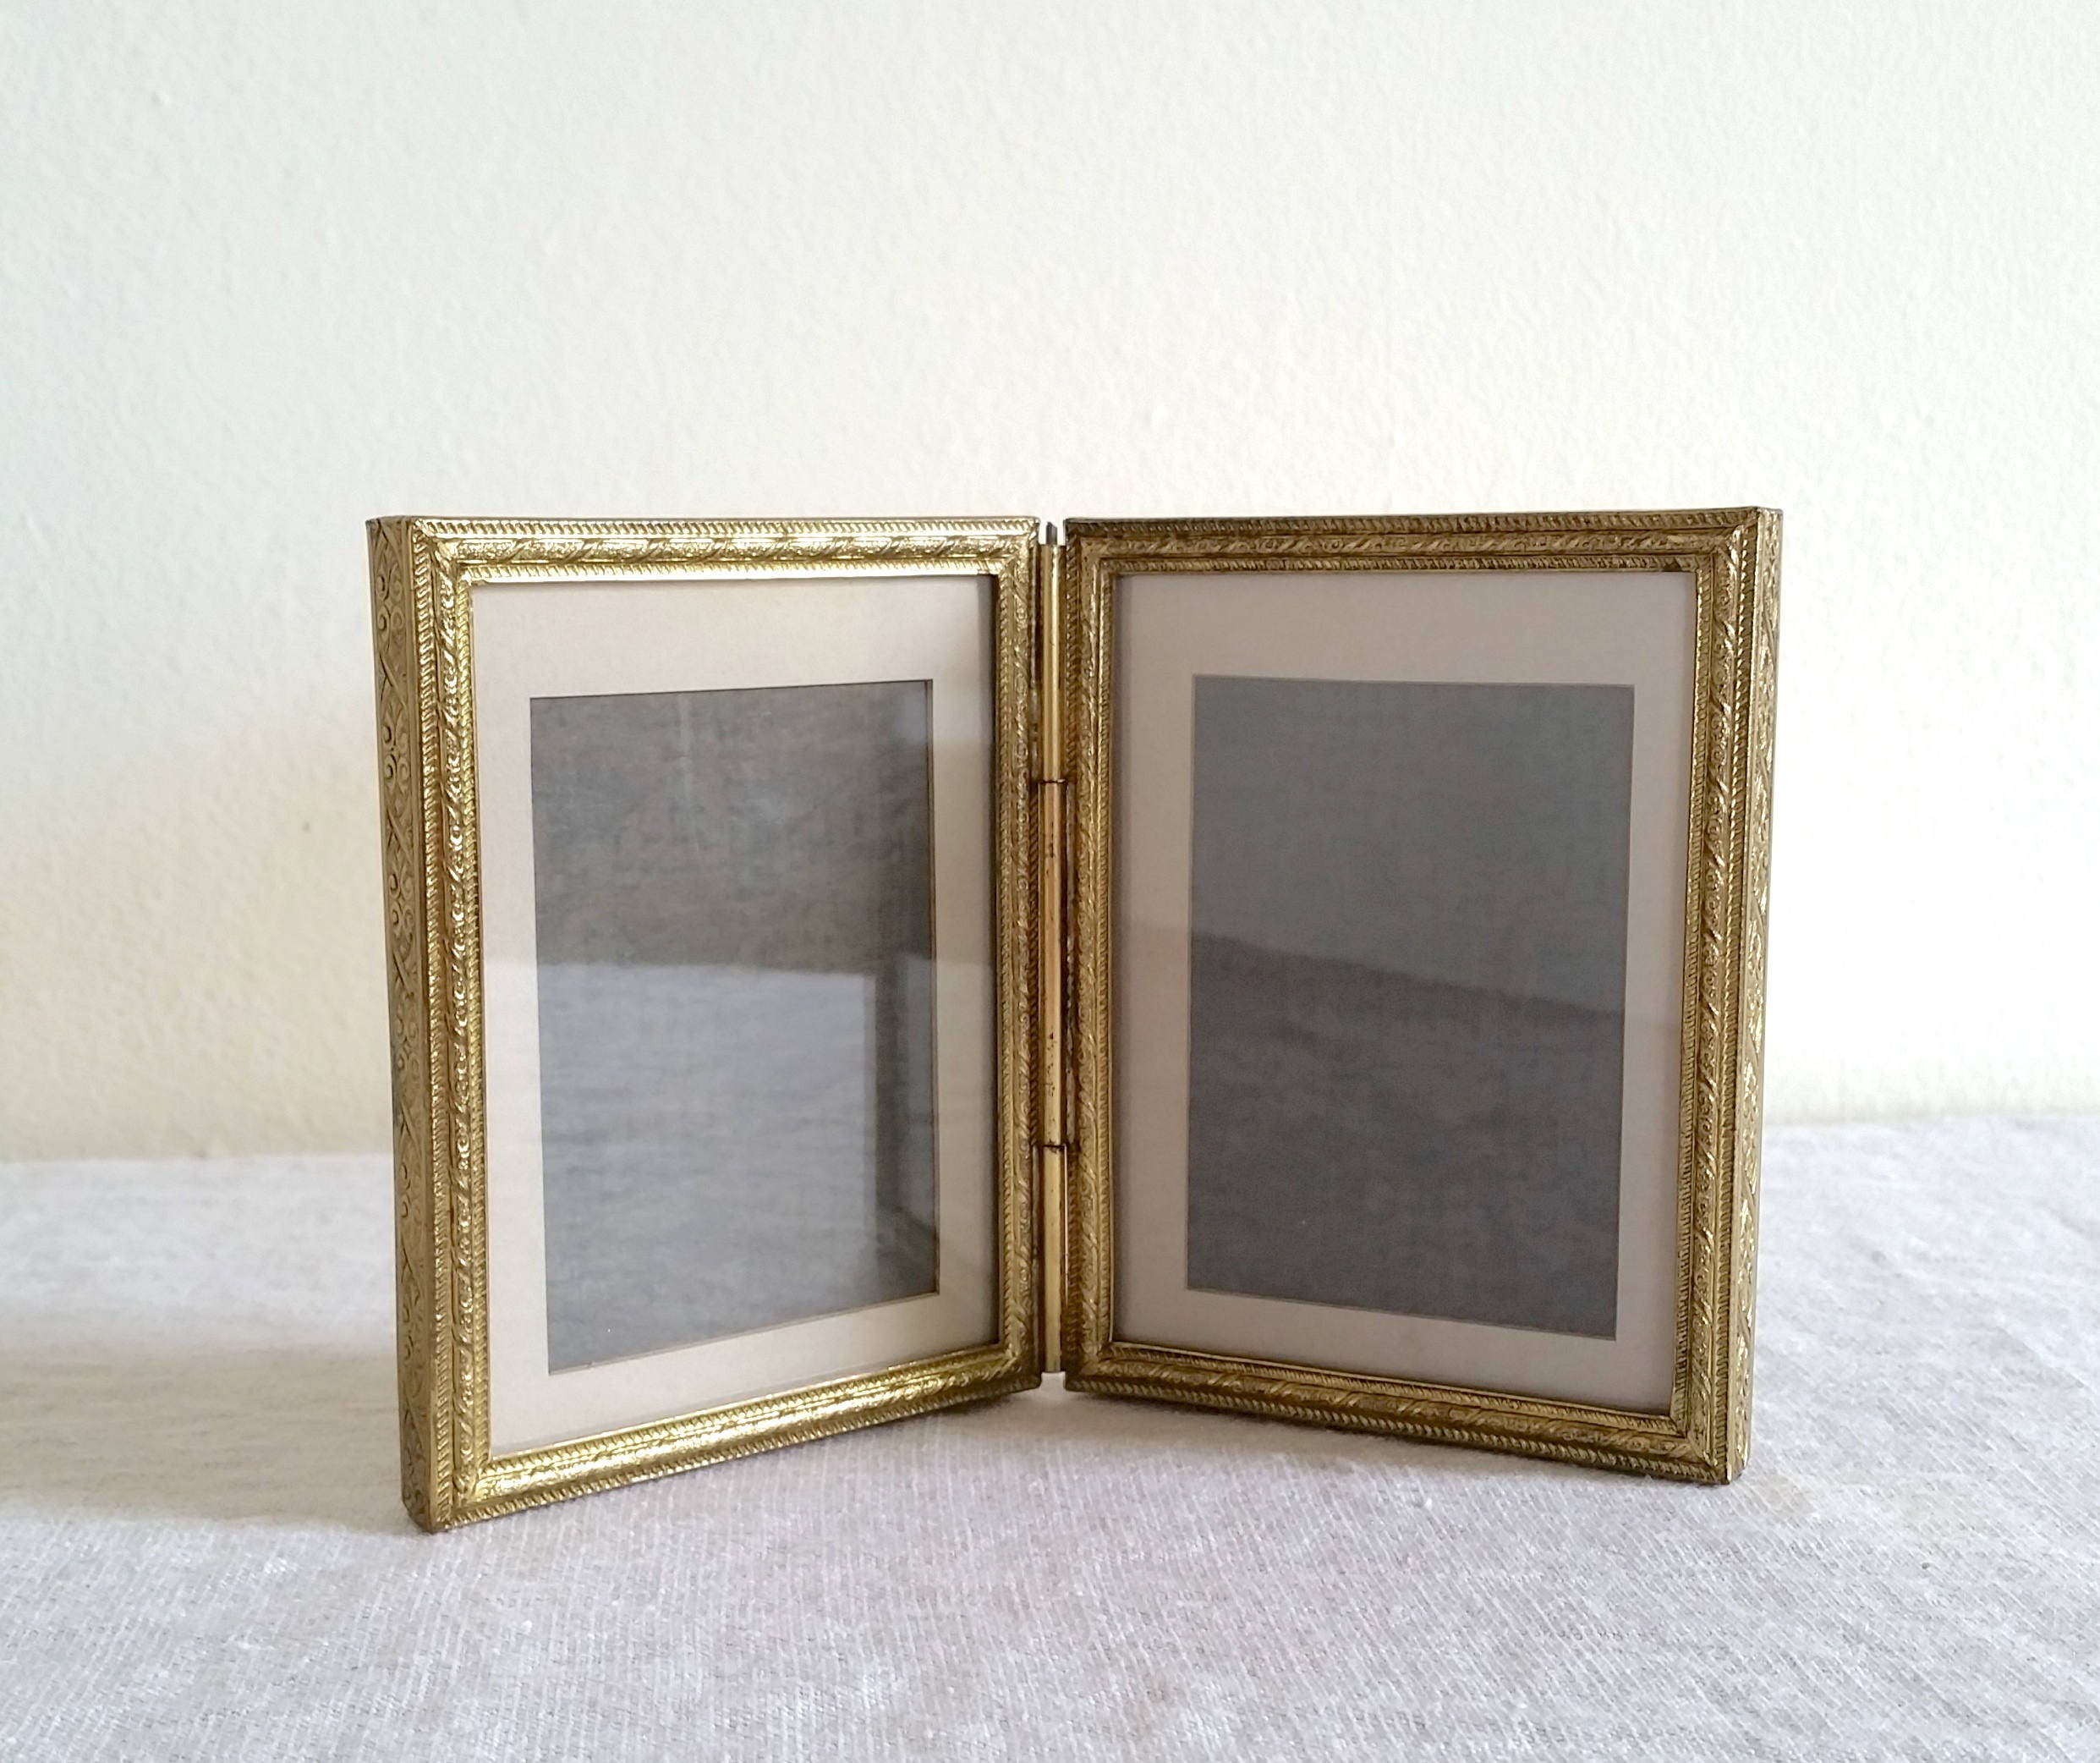 Vintage Hinged Frame, Hinged Two-Part Antique Gold Frame with Velvet ...